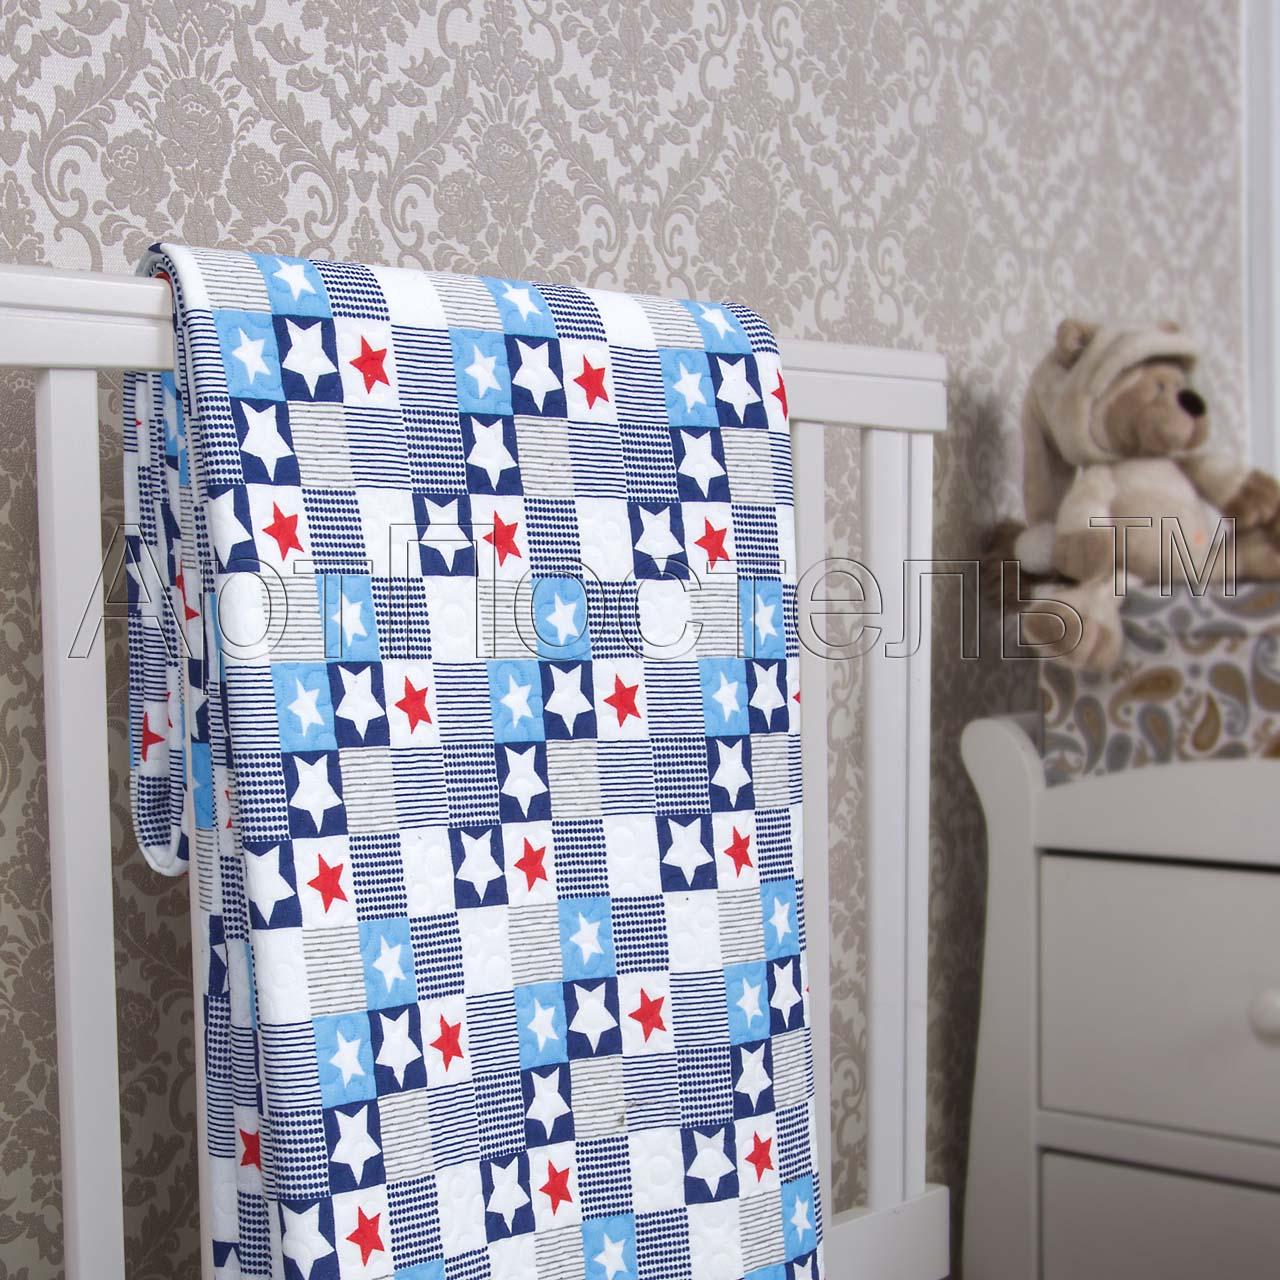 Покрывало  Звезды  р. 140х200 - Текстиль для дома артикул: 33985